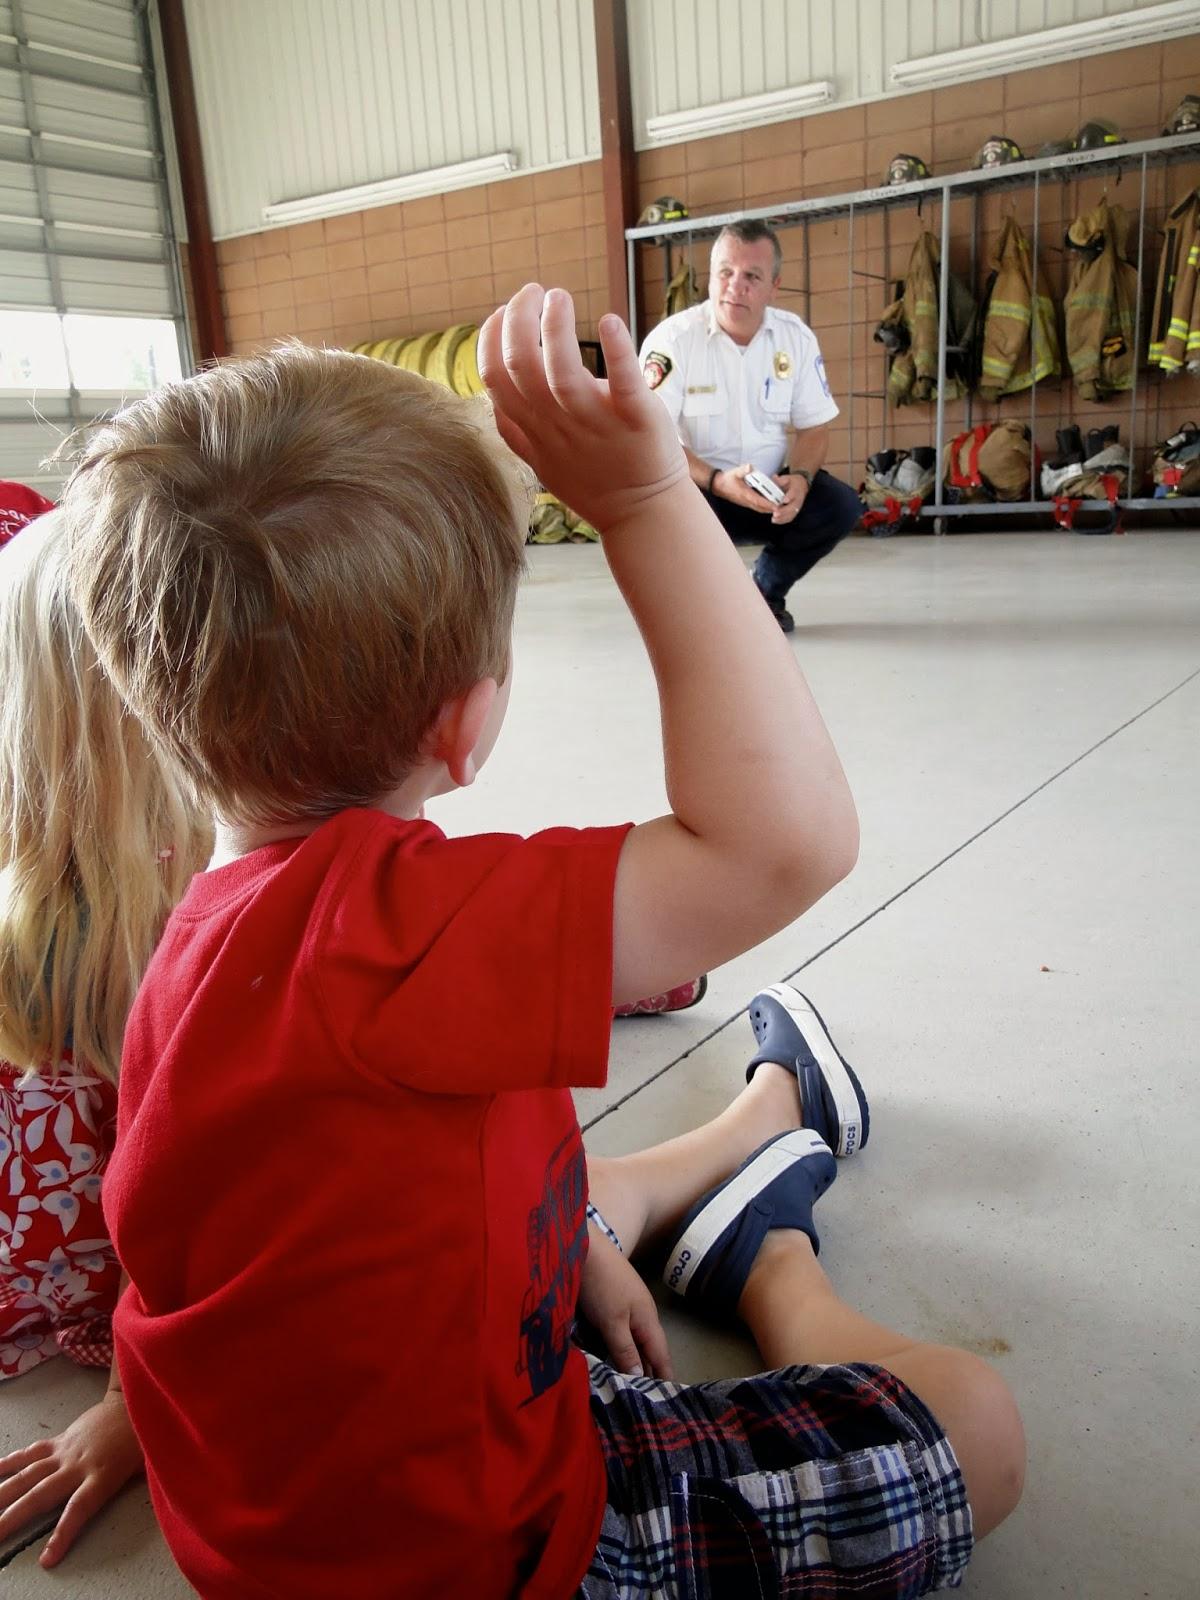 Fire Station Visit 2013